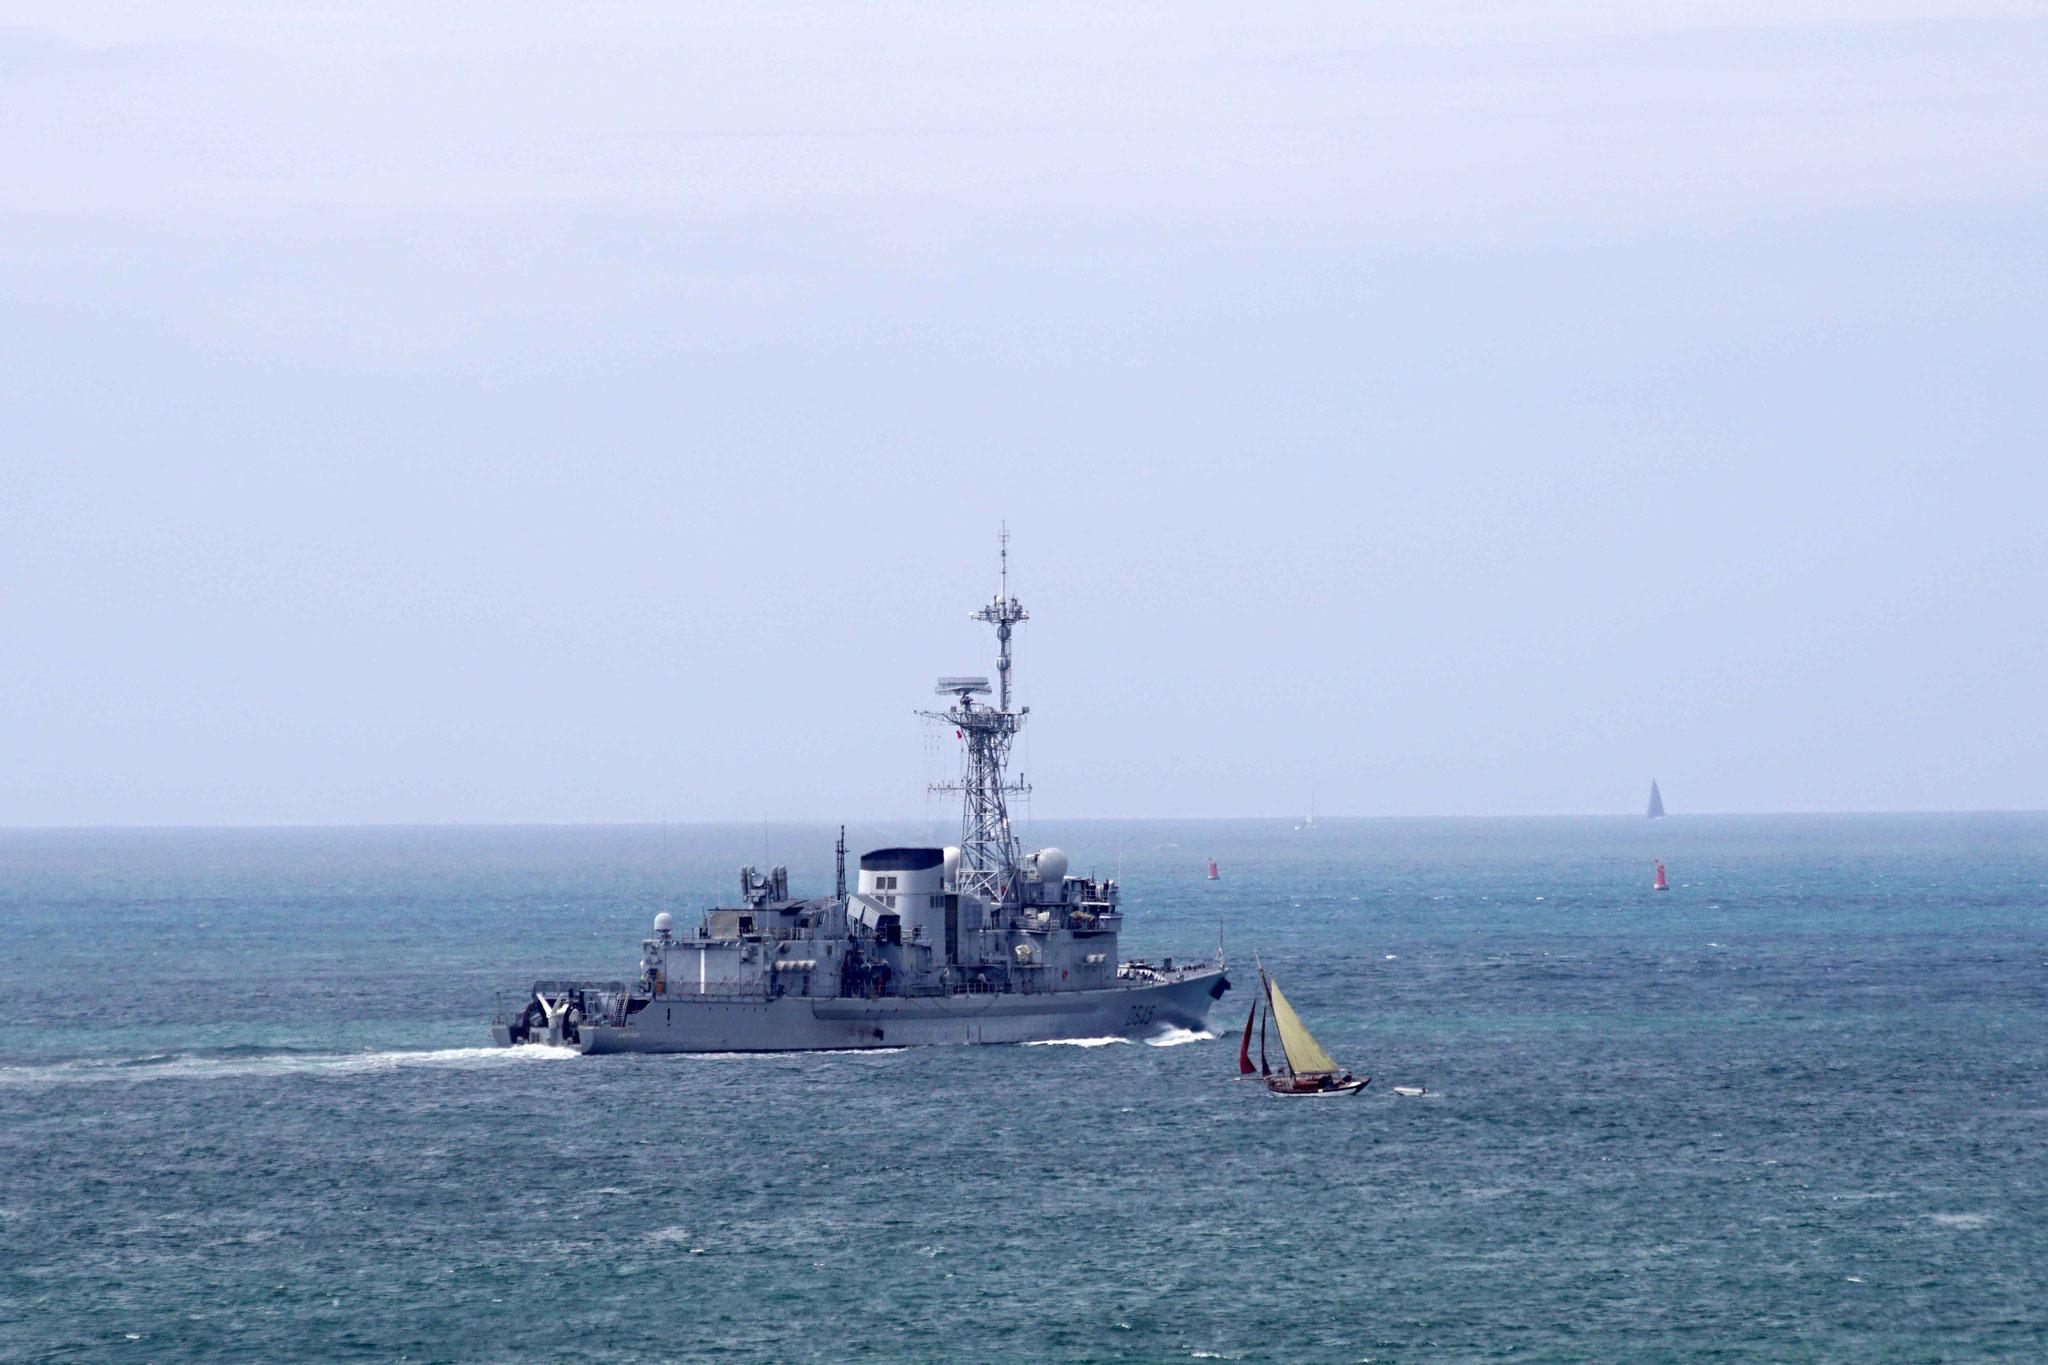 Vers la mer D'Iroise